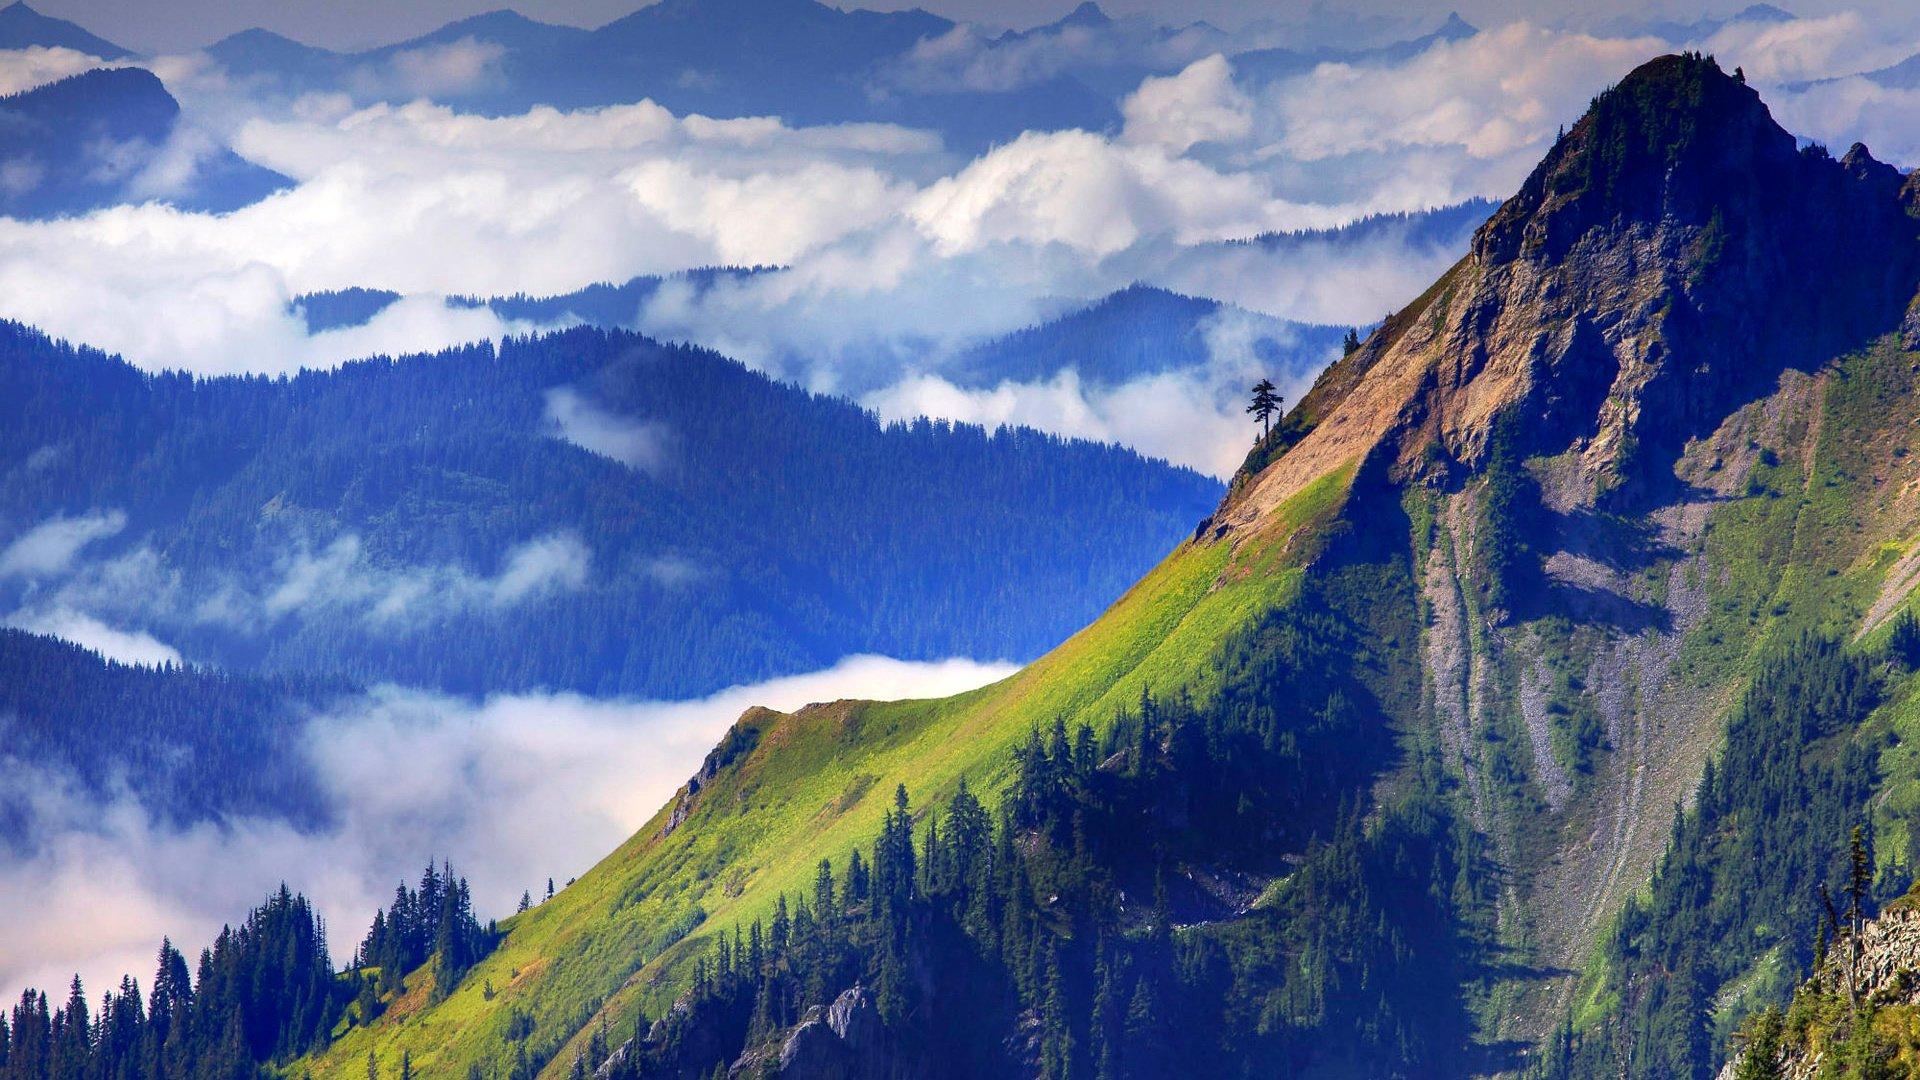 туман ущелье скалы горы скачать